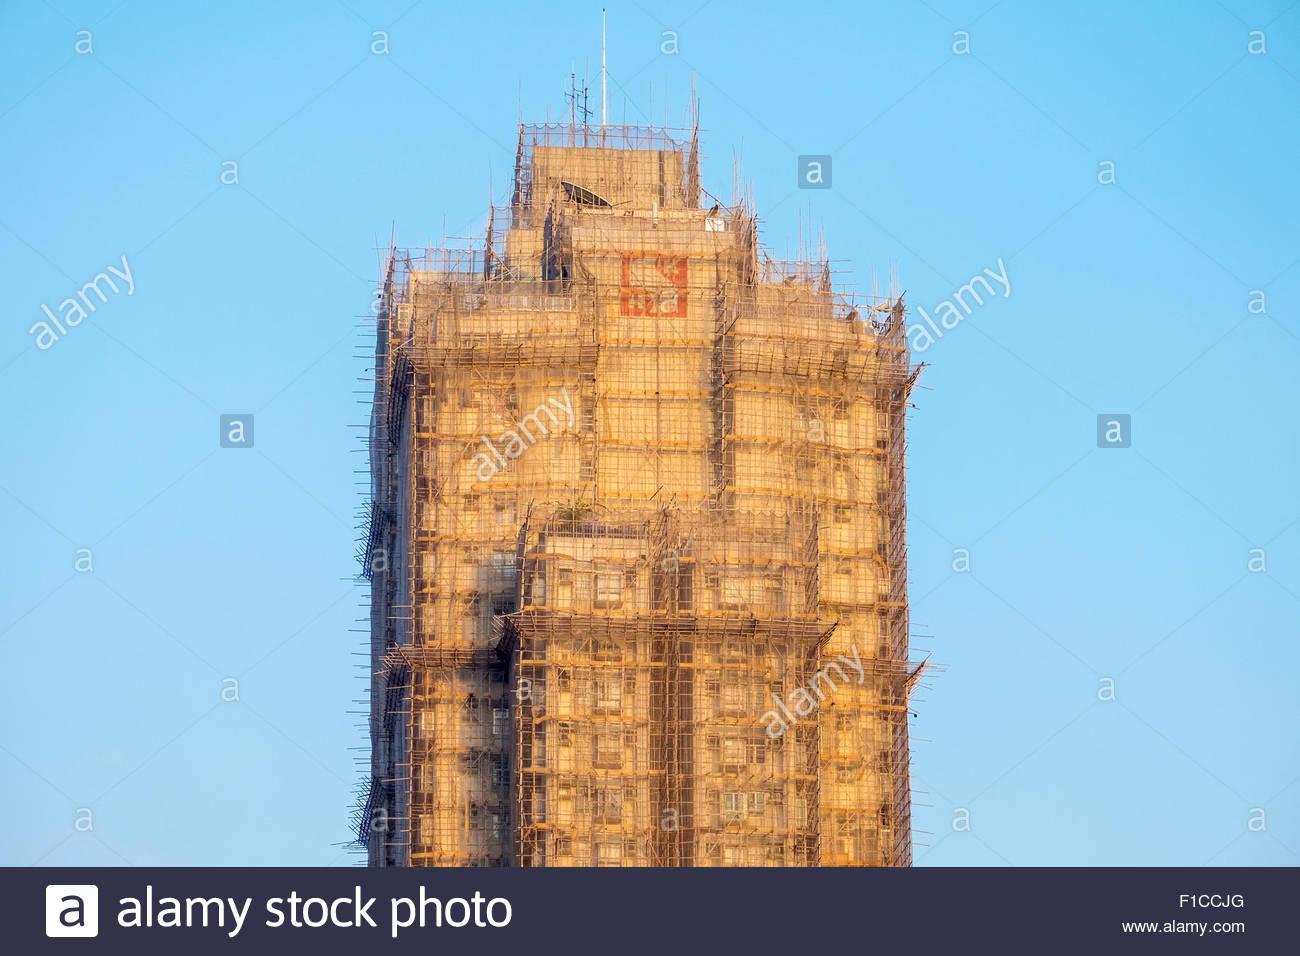 Skyscraper covered with bamboo scaffolding, Wong Tai Sin district, Kowloon, Hong Kong, China - Stock Image